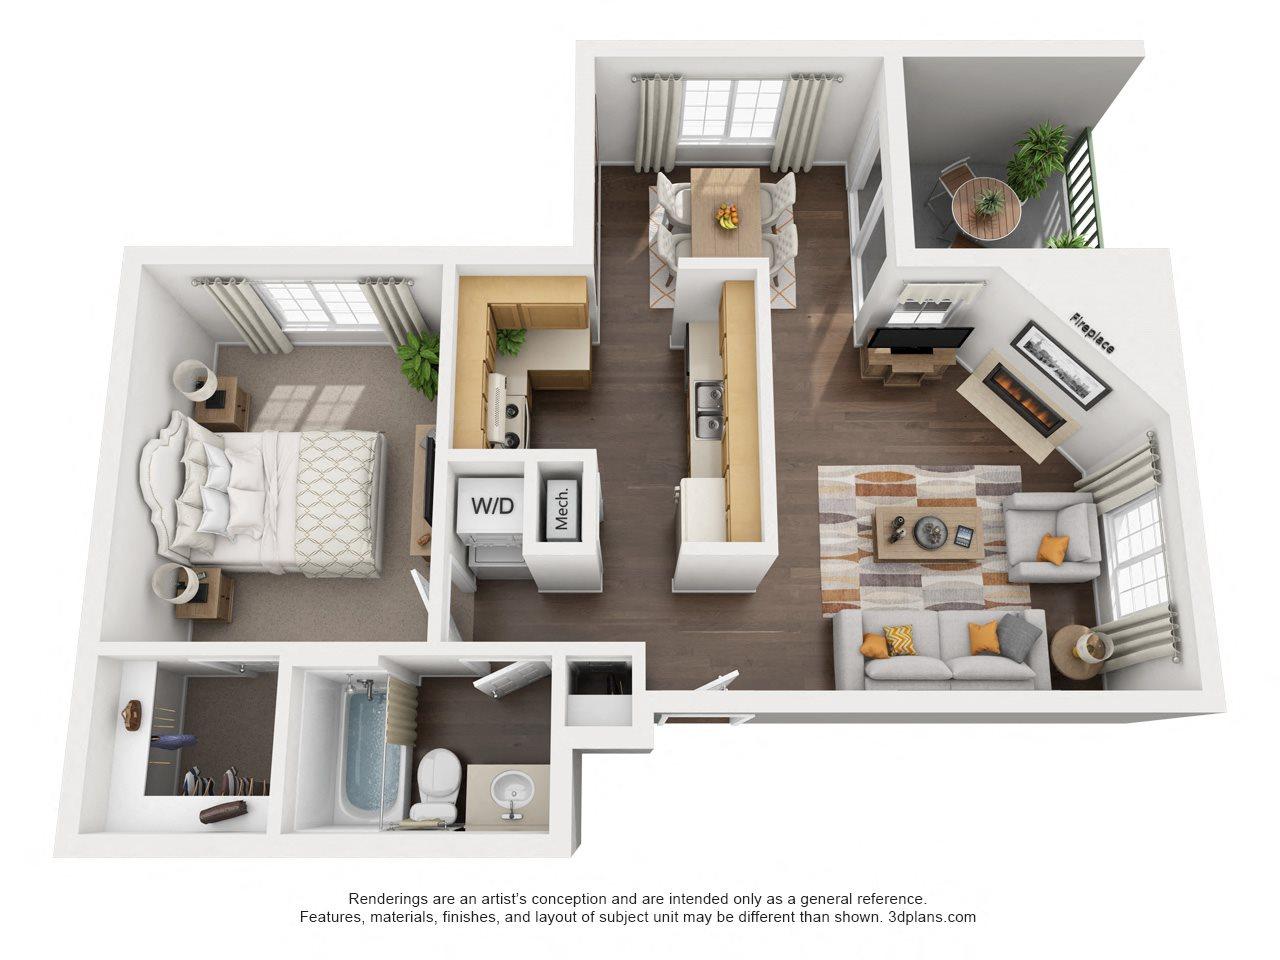 1 Bedroom, 1 Bath, Upstairs Floor Plan 2